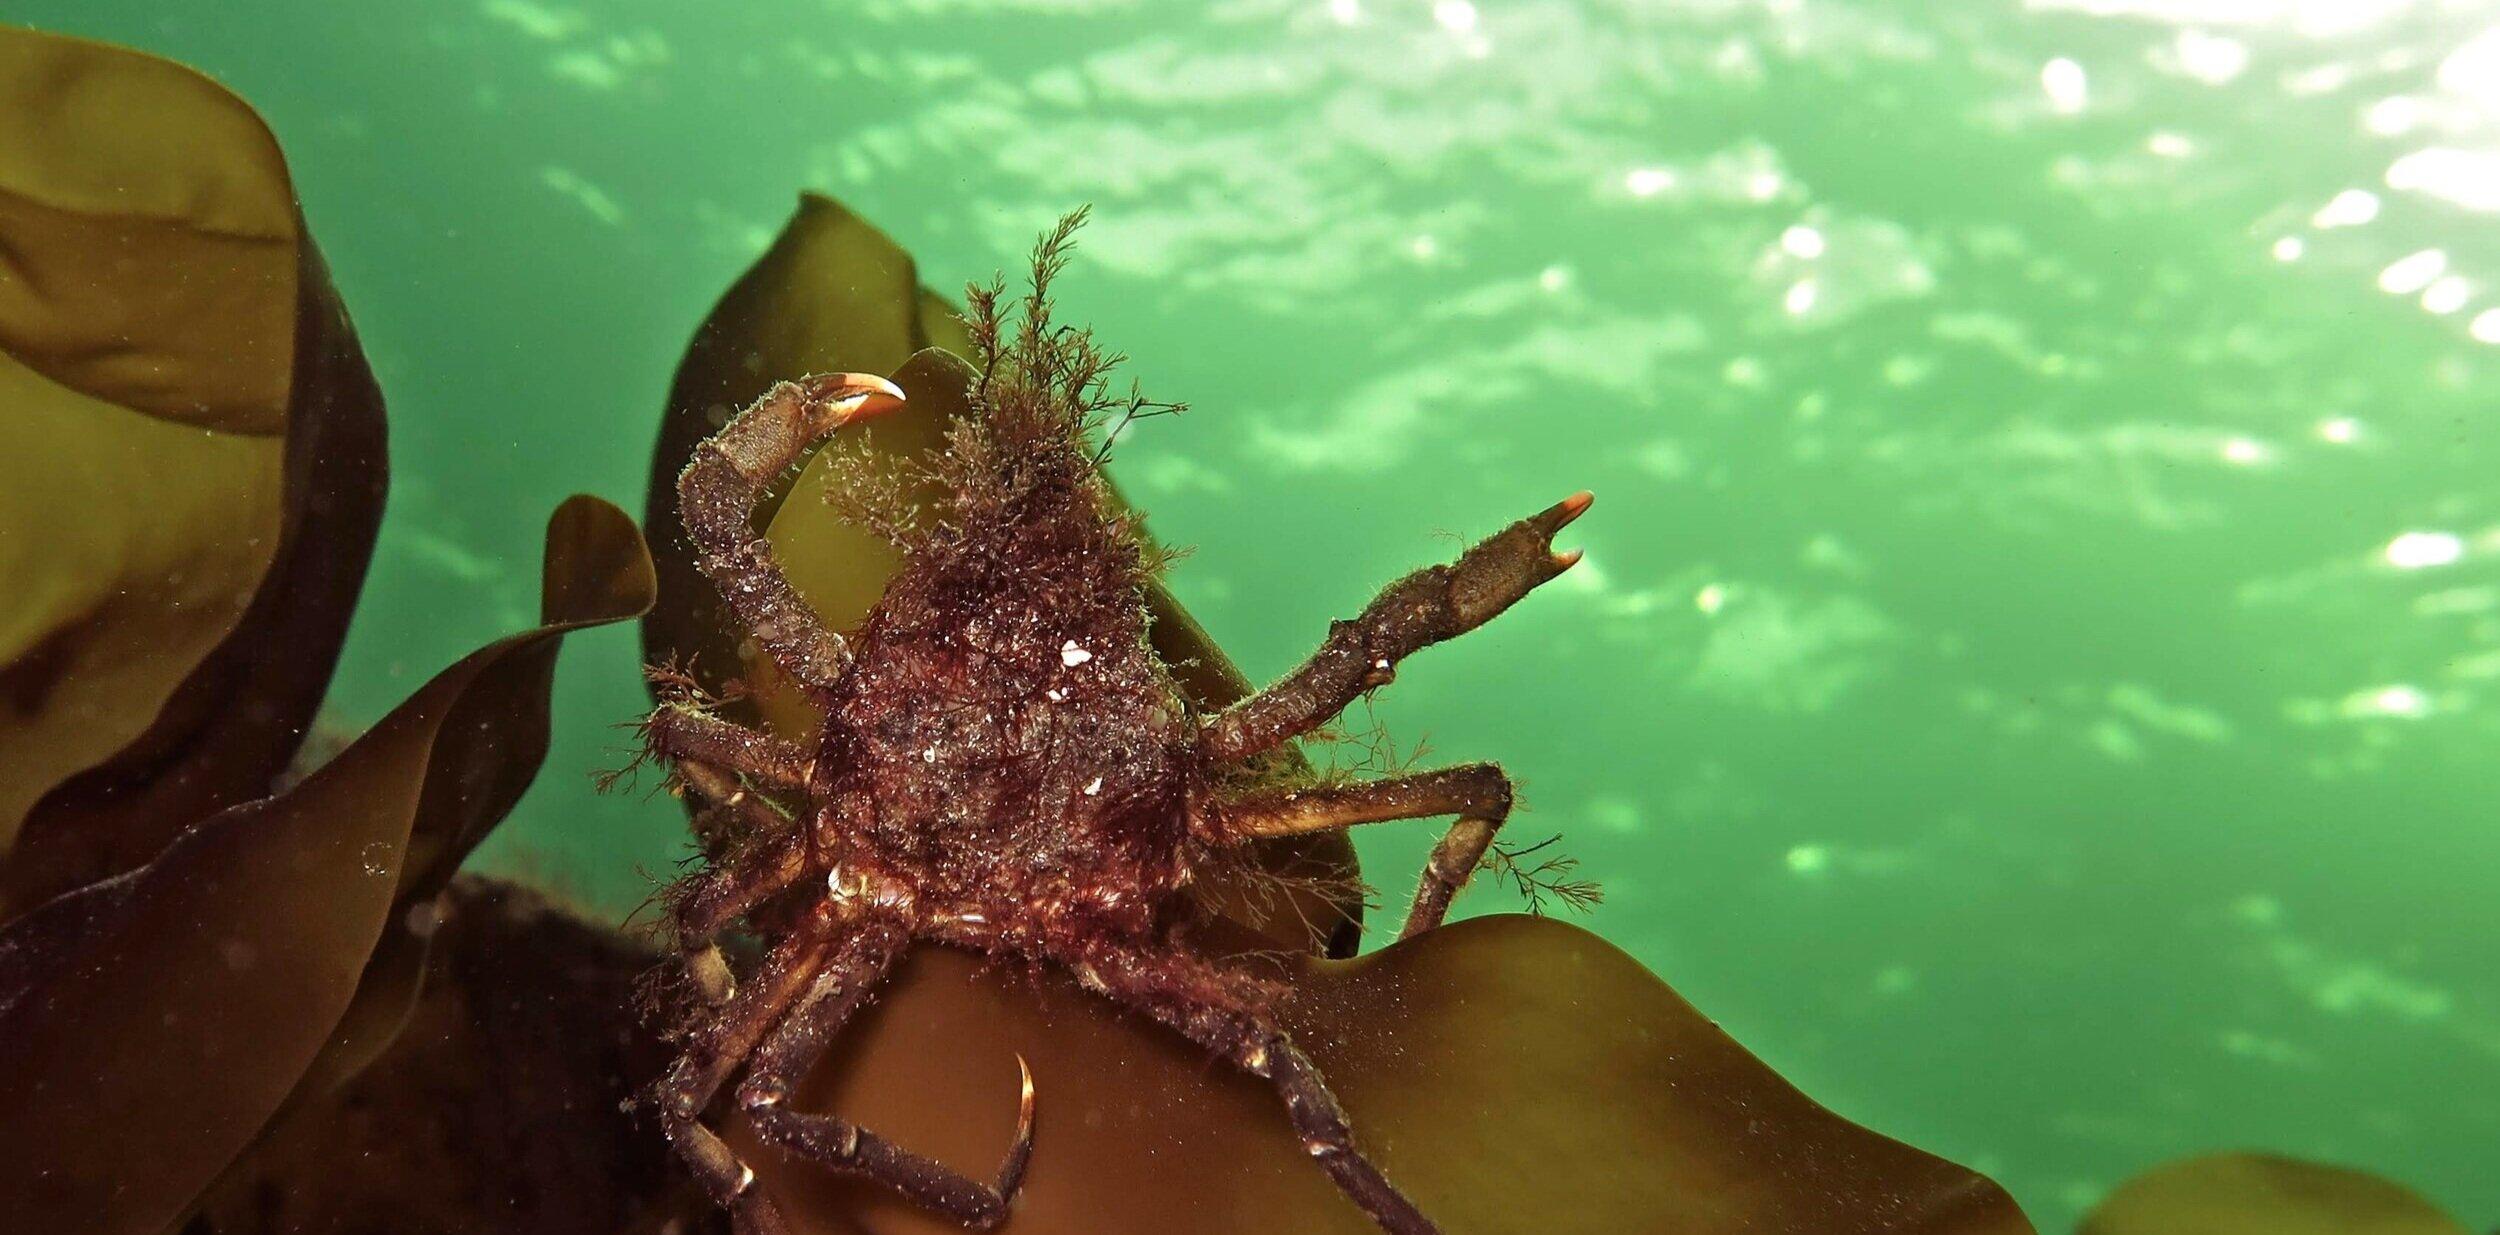 Dab crab. Foto: Tine Kinn Kvamme